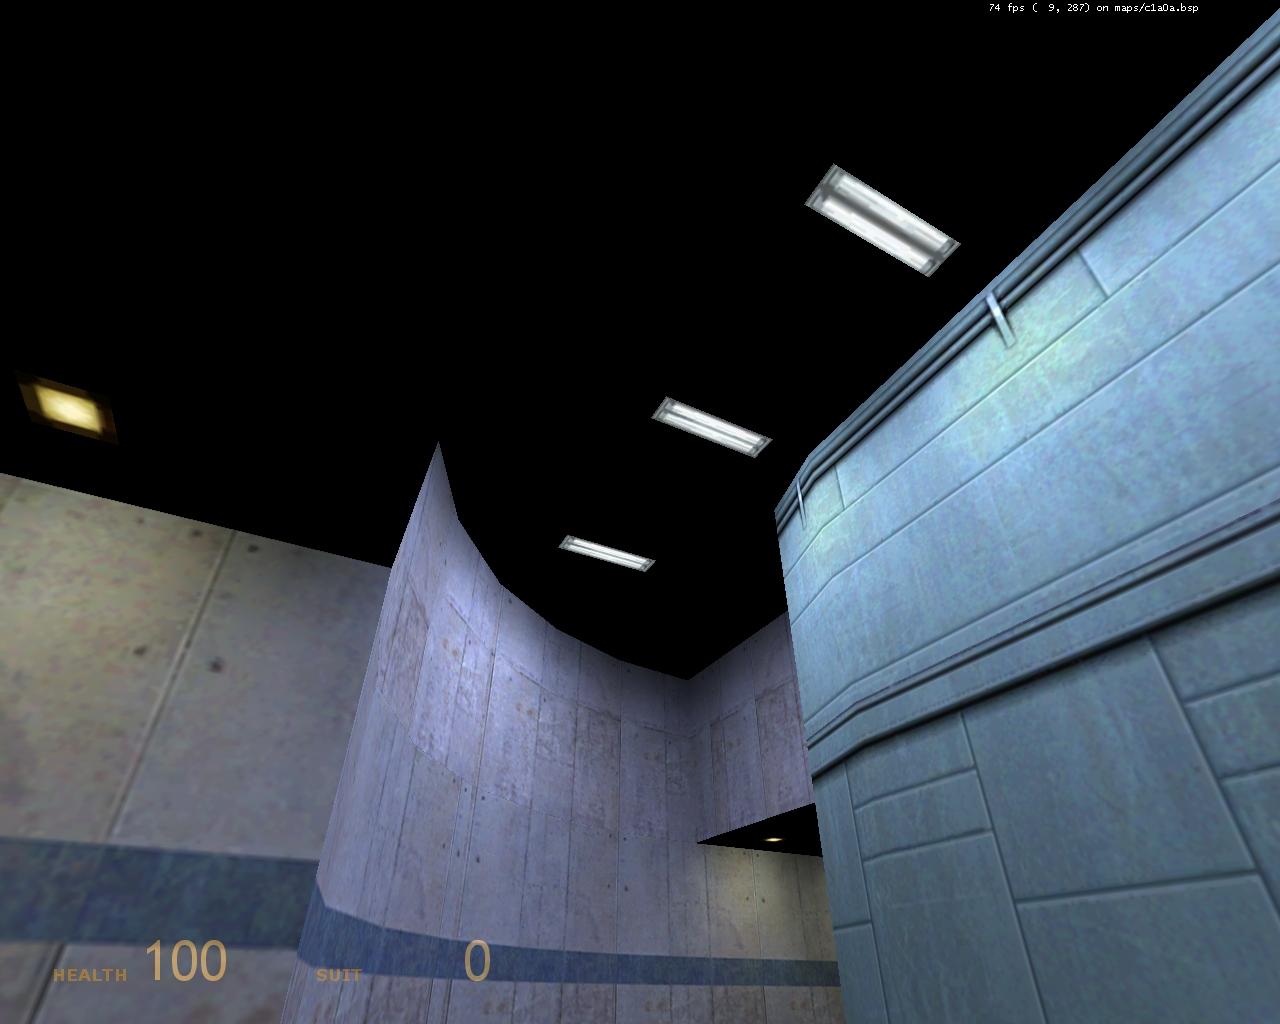 Half-Life Ports - Half-Life: Source Half-Life 2 Beta, Half-Life Ports, Half-Life Source, leak